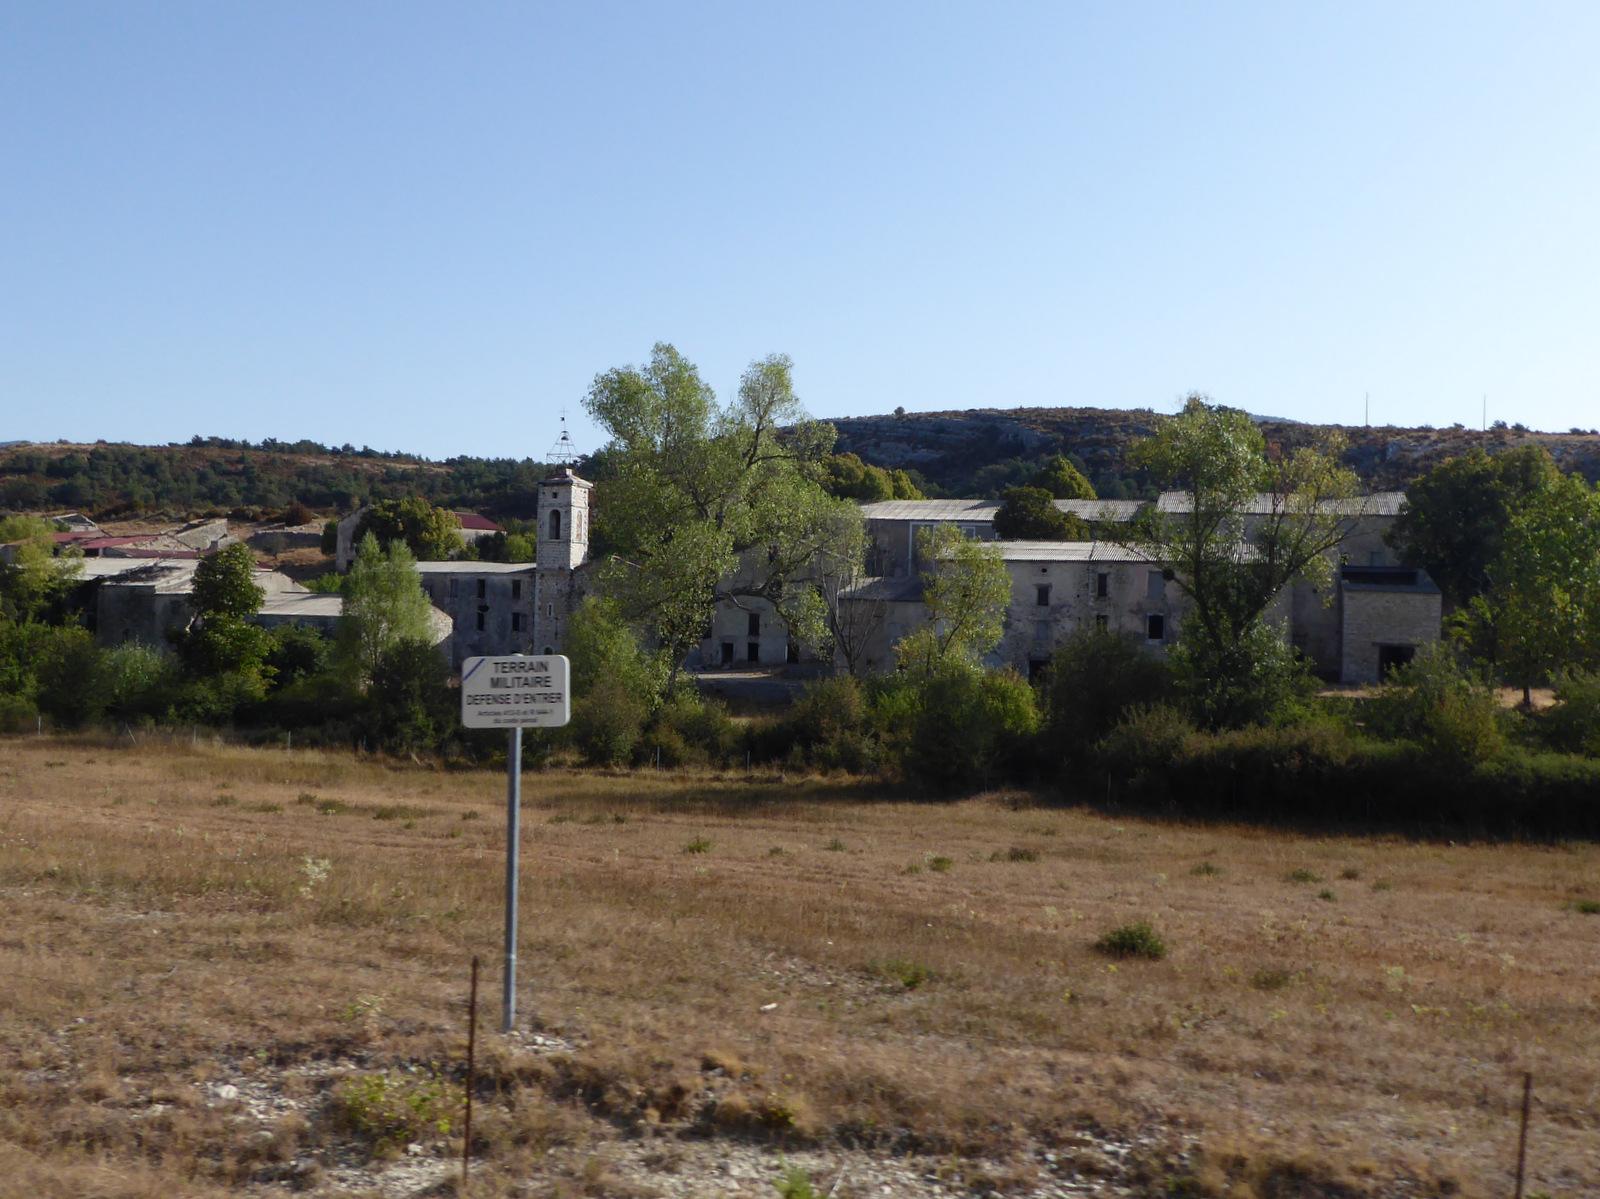 Brovès, le village fantôme